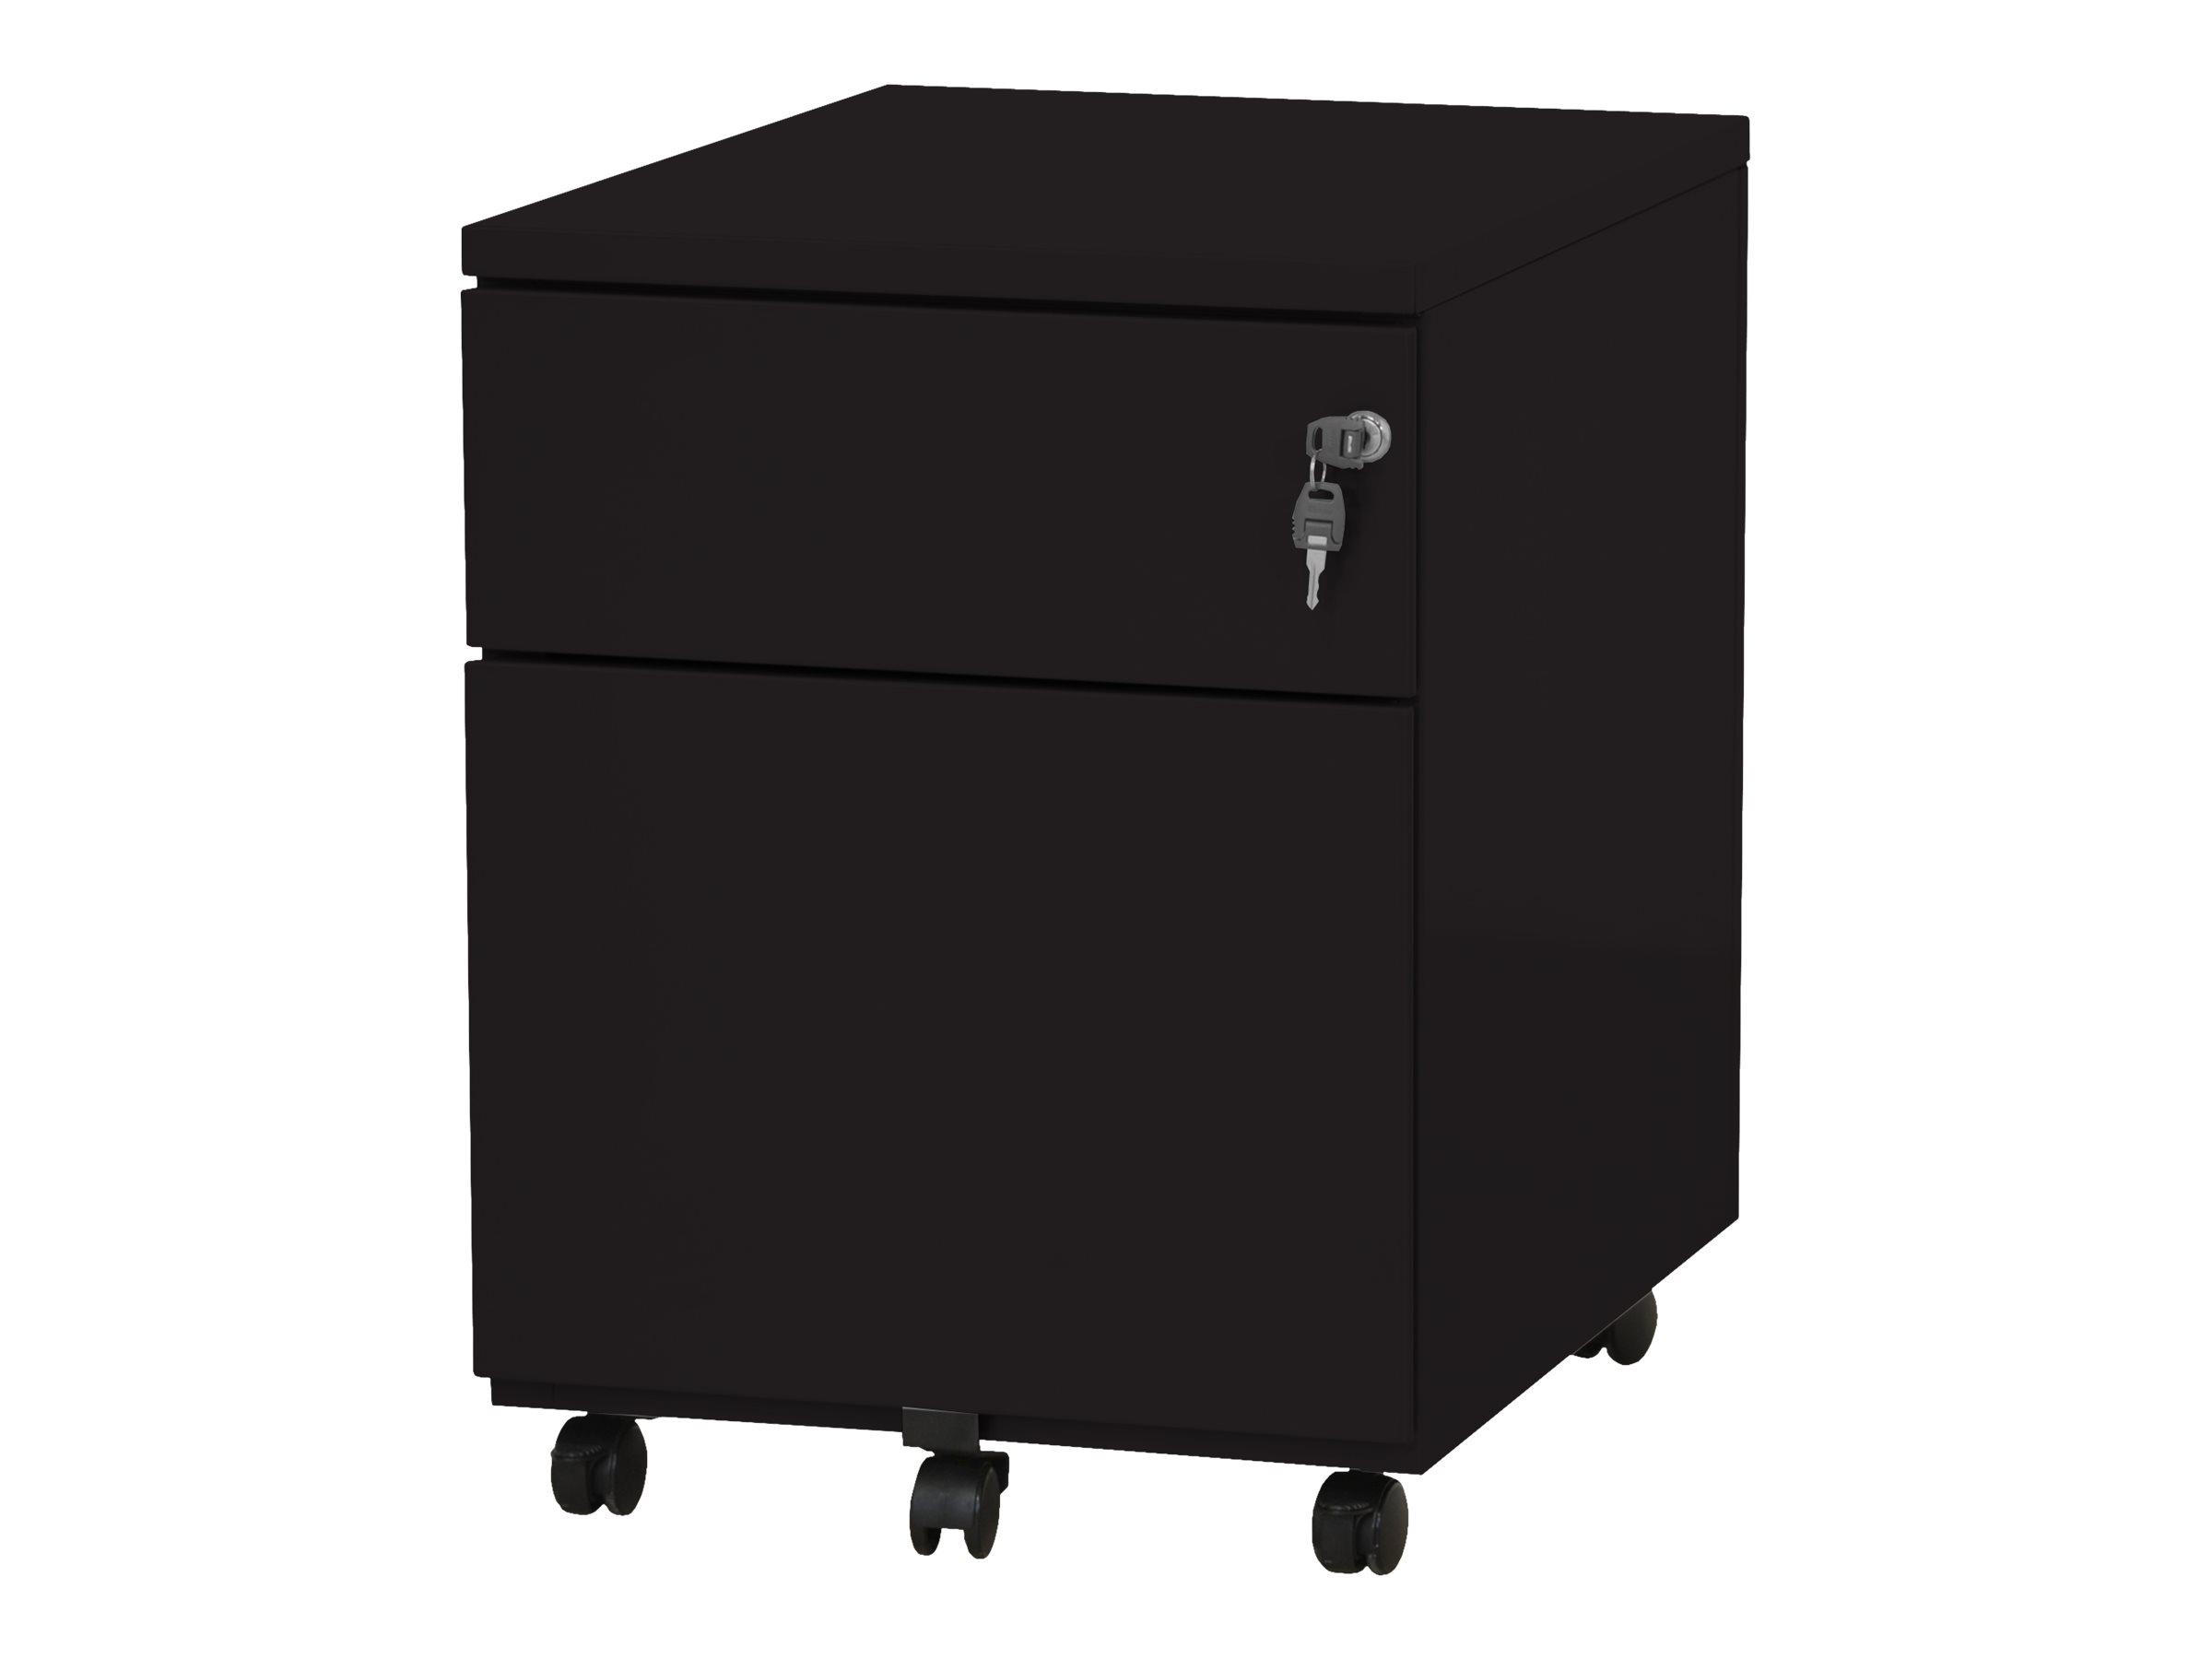 Caisson mobile - 2 tiroirs - noir - 56,7 x 54,1 x 41,8 cm